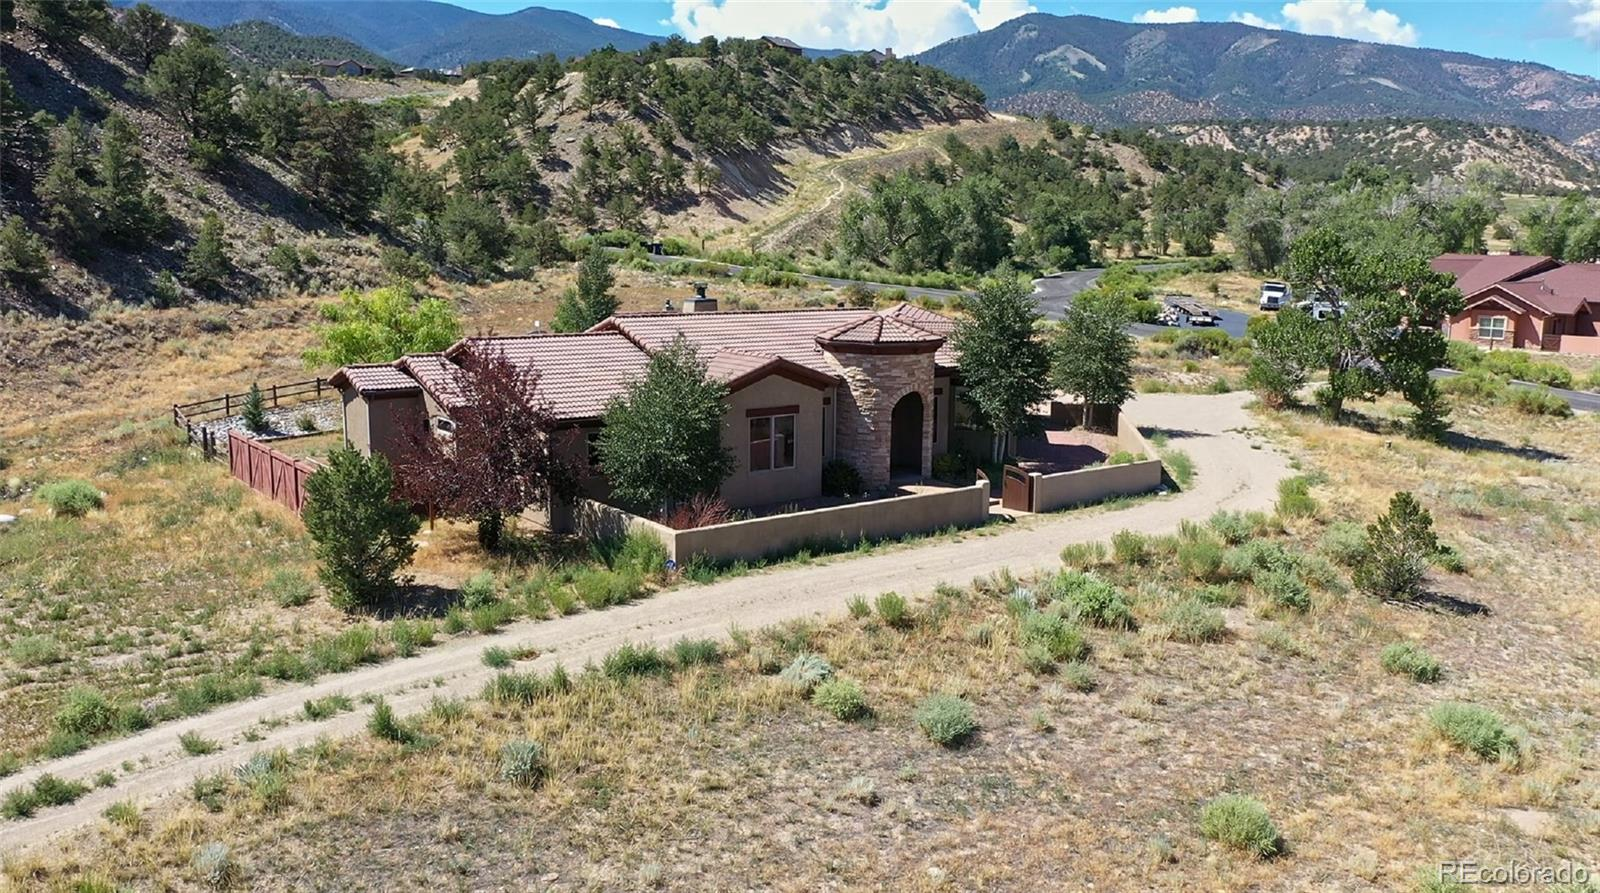 8129 Buck Run, Salida, CO 81201 - Salida, CO real estate listing